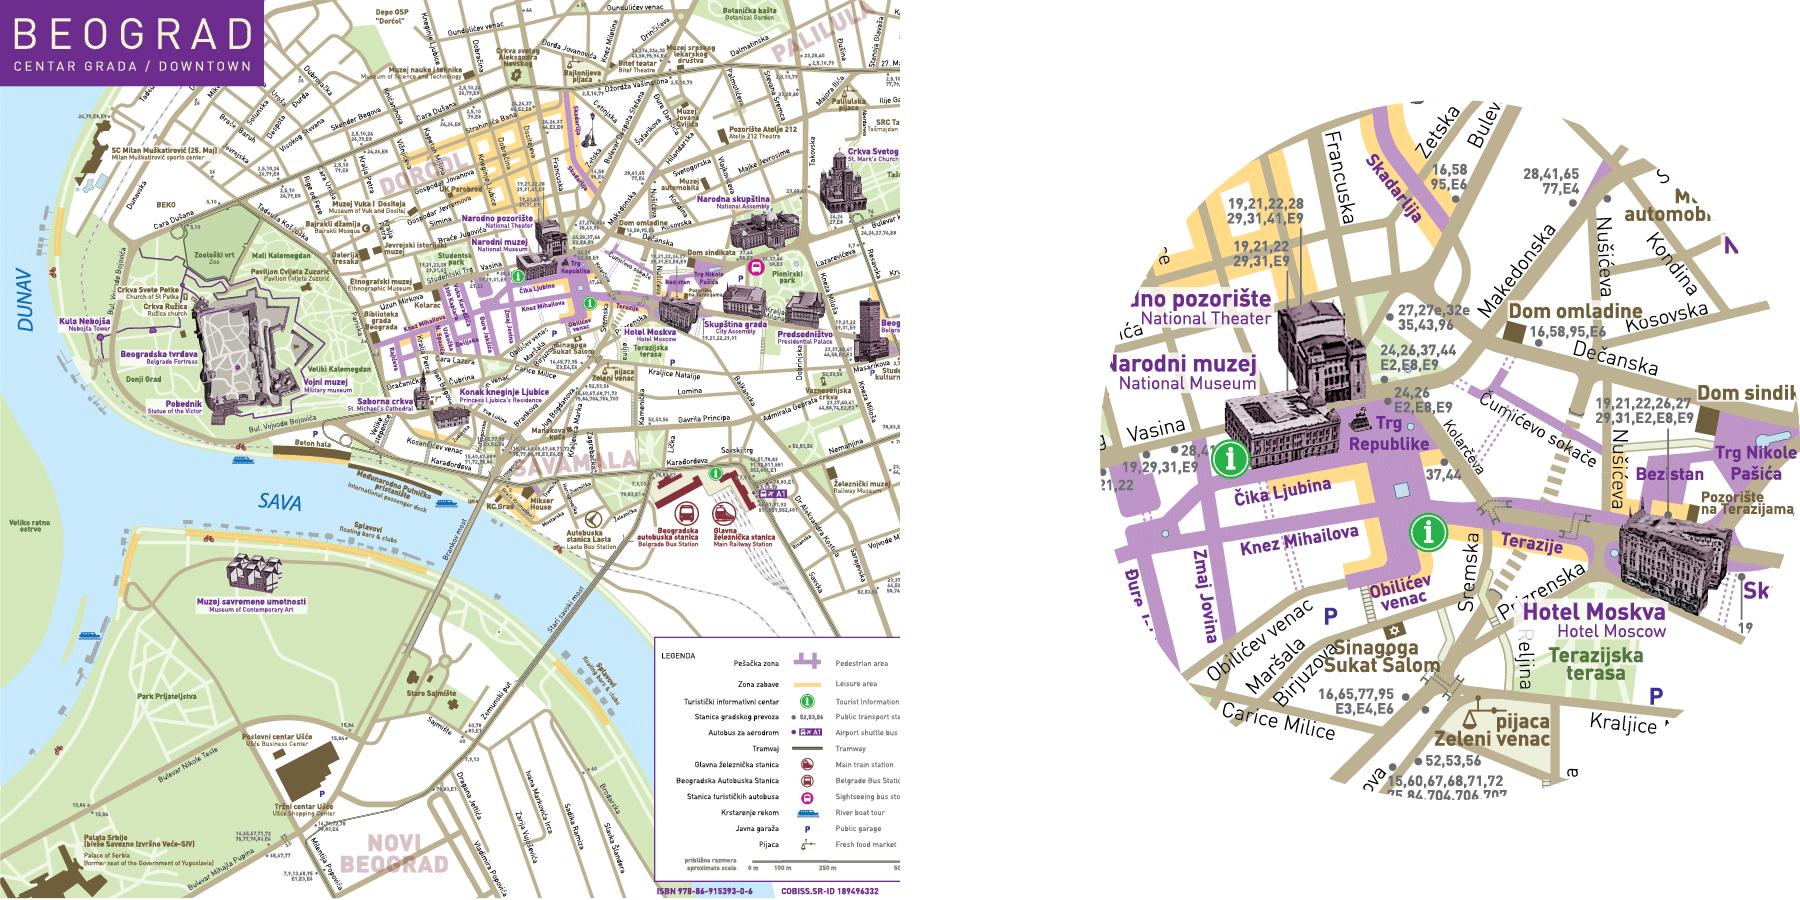 maps jug cerovic architect